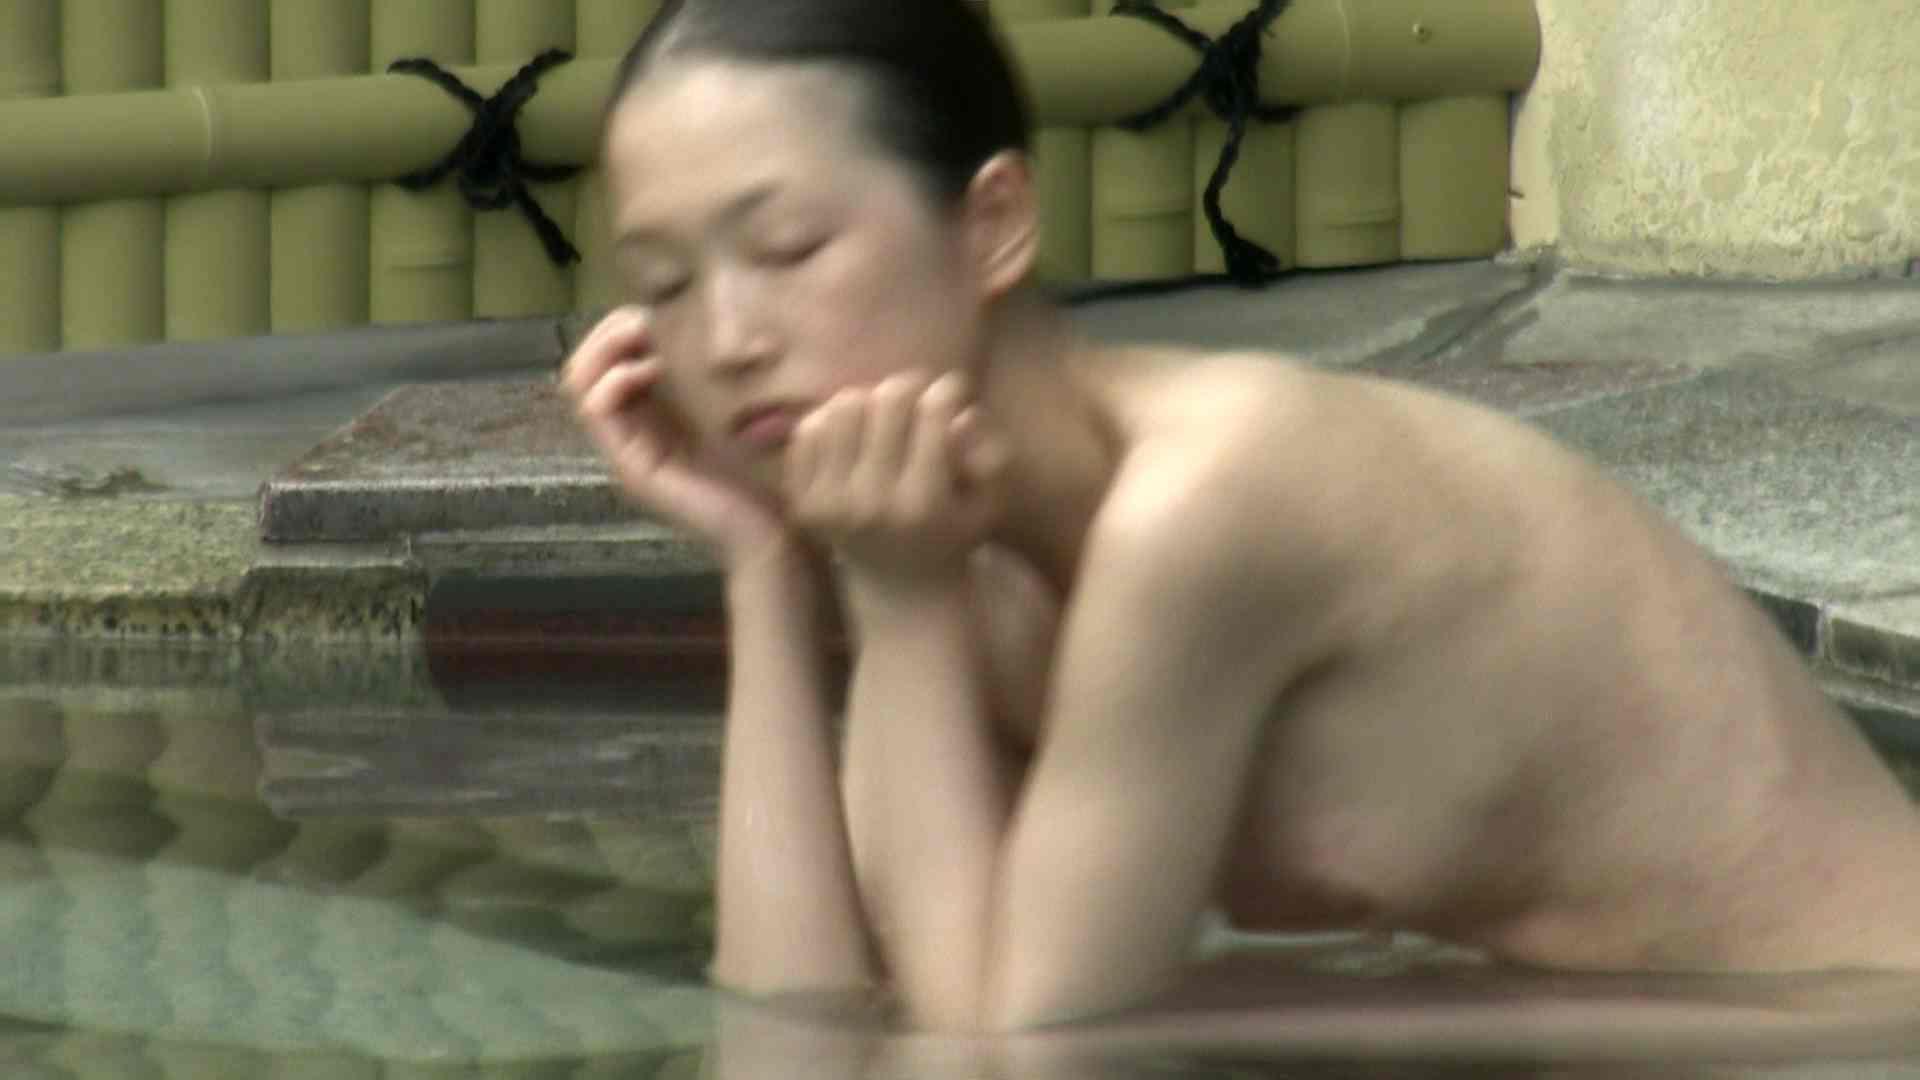 Aquaな露天風呂Vol.661 OLセックス  105画像 21